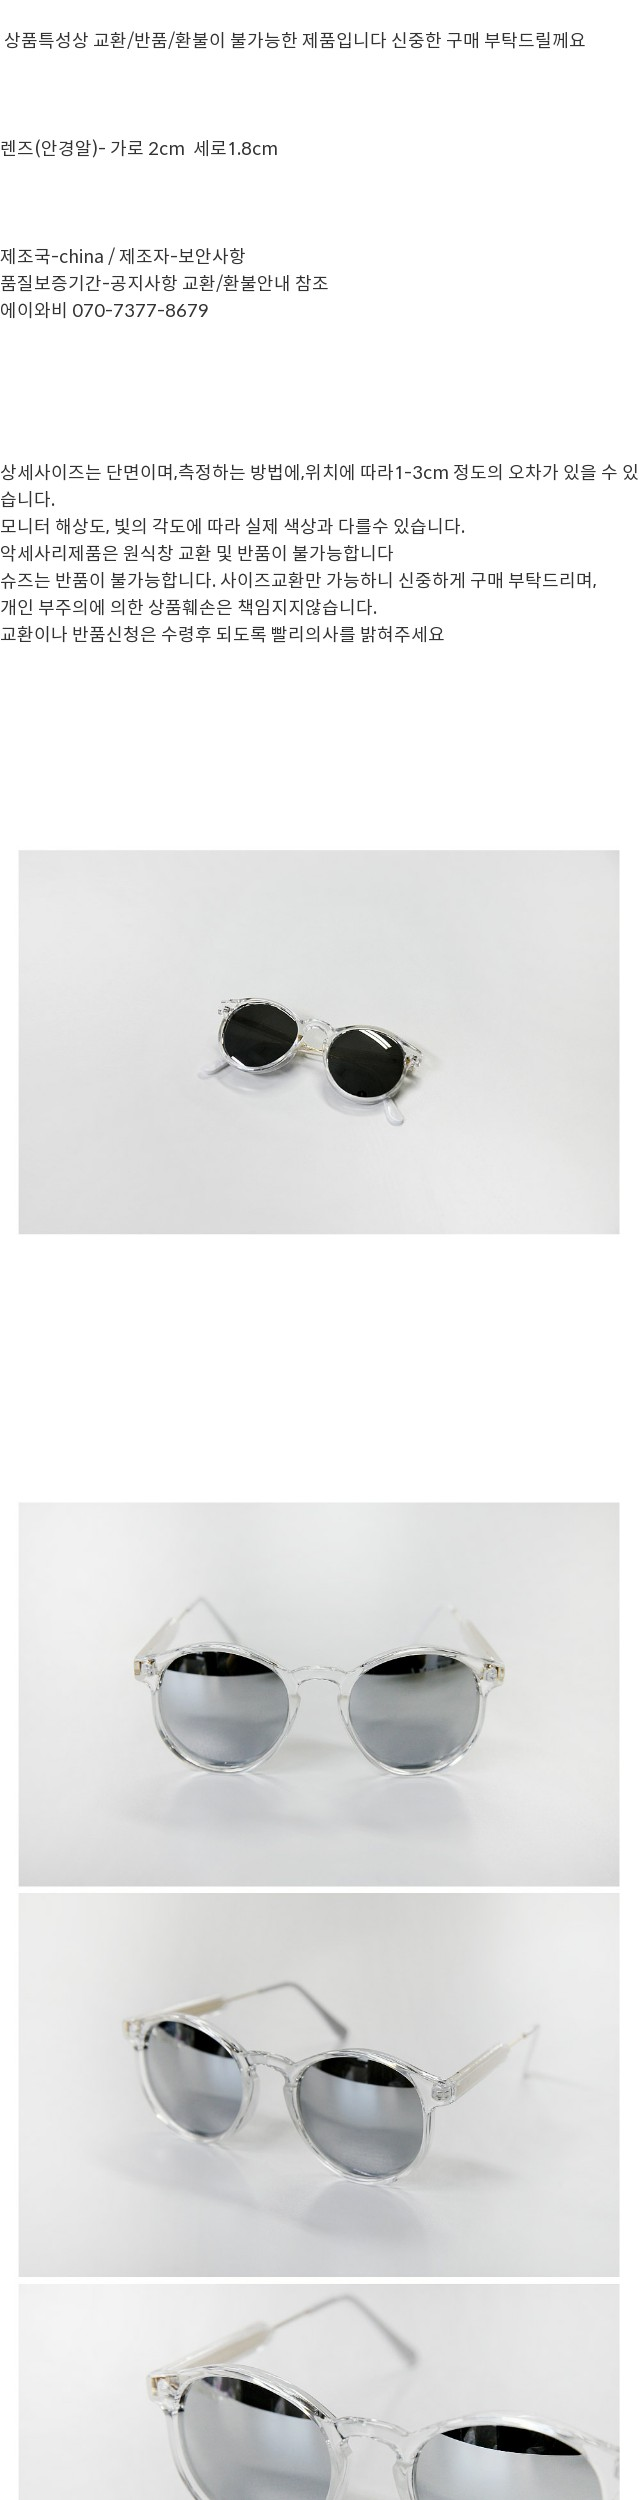 Lollipop Transparent Sunglasses